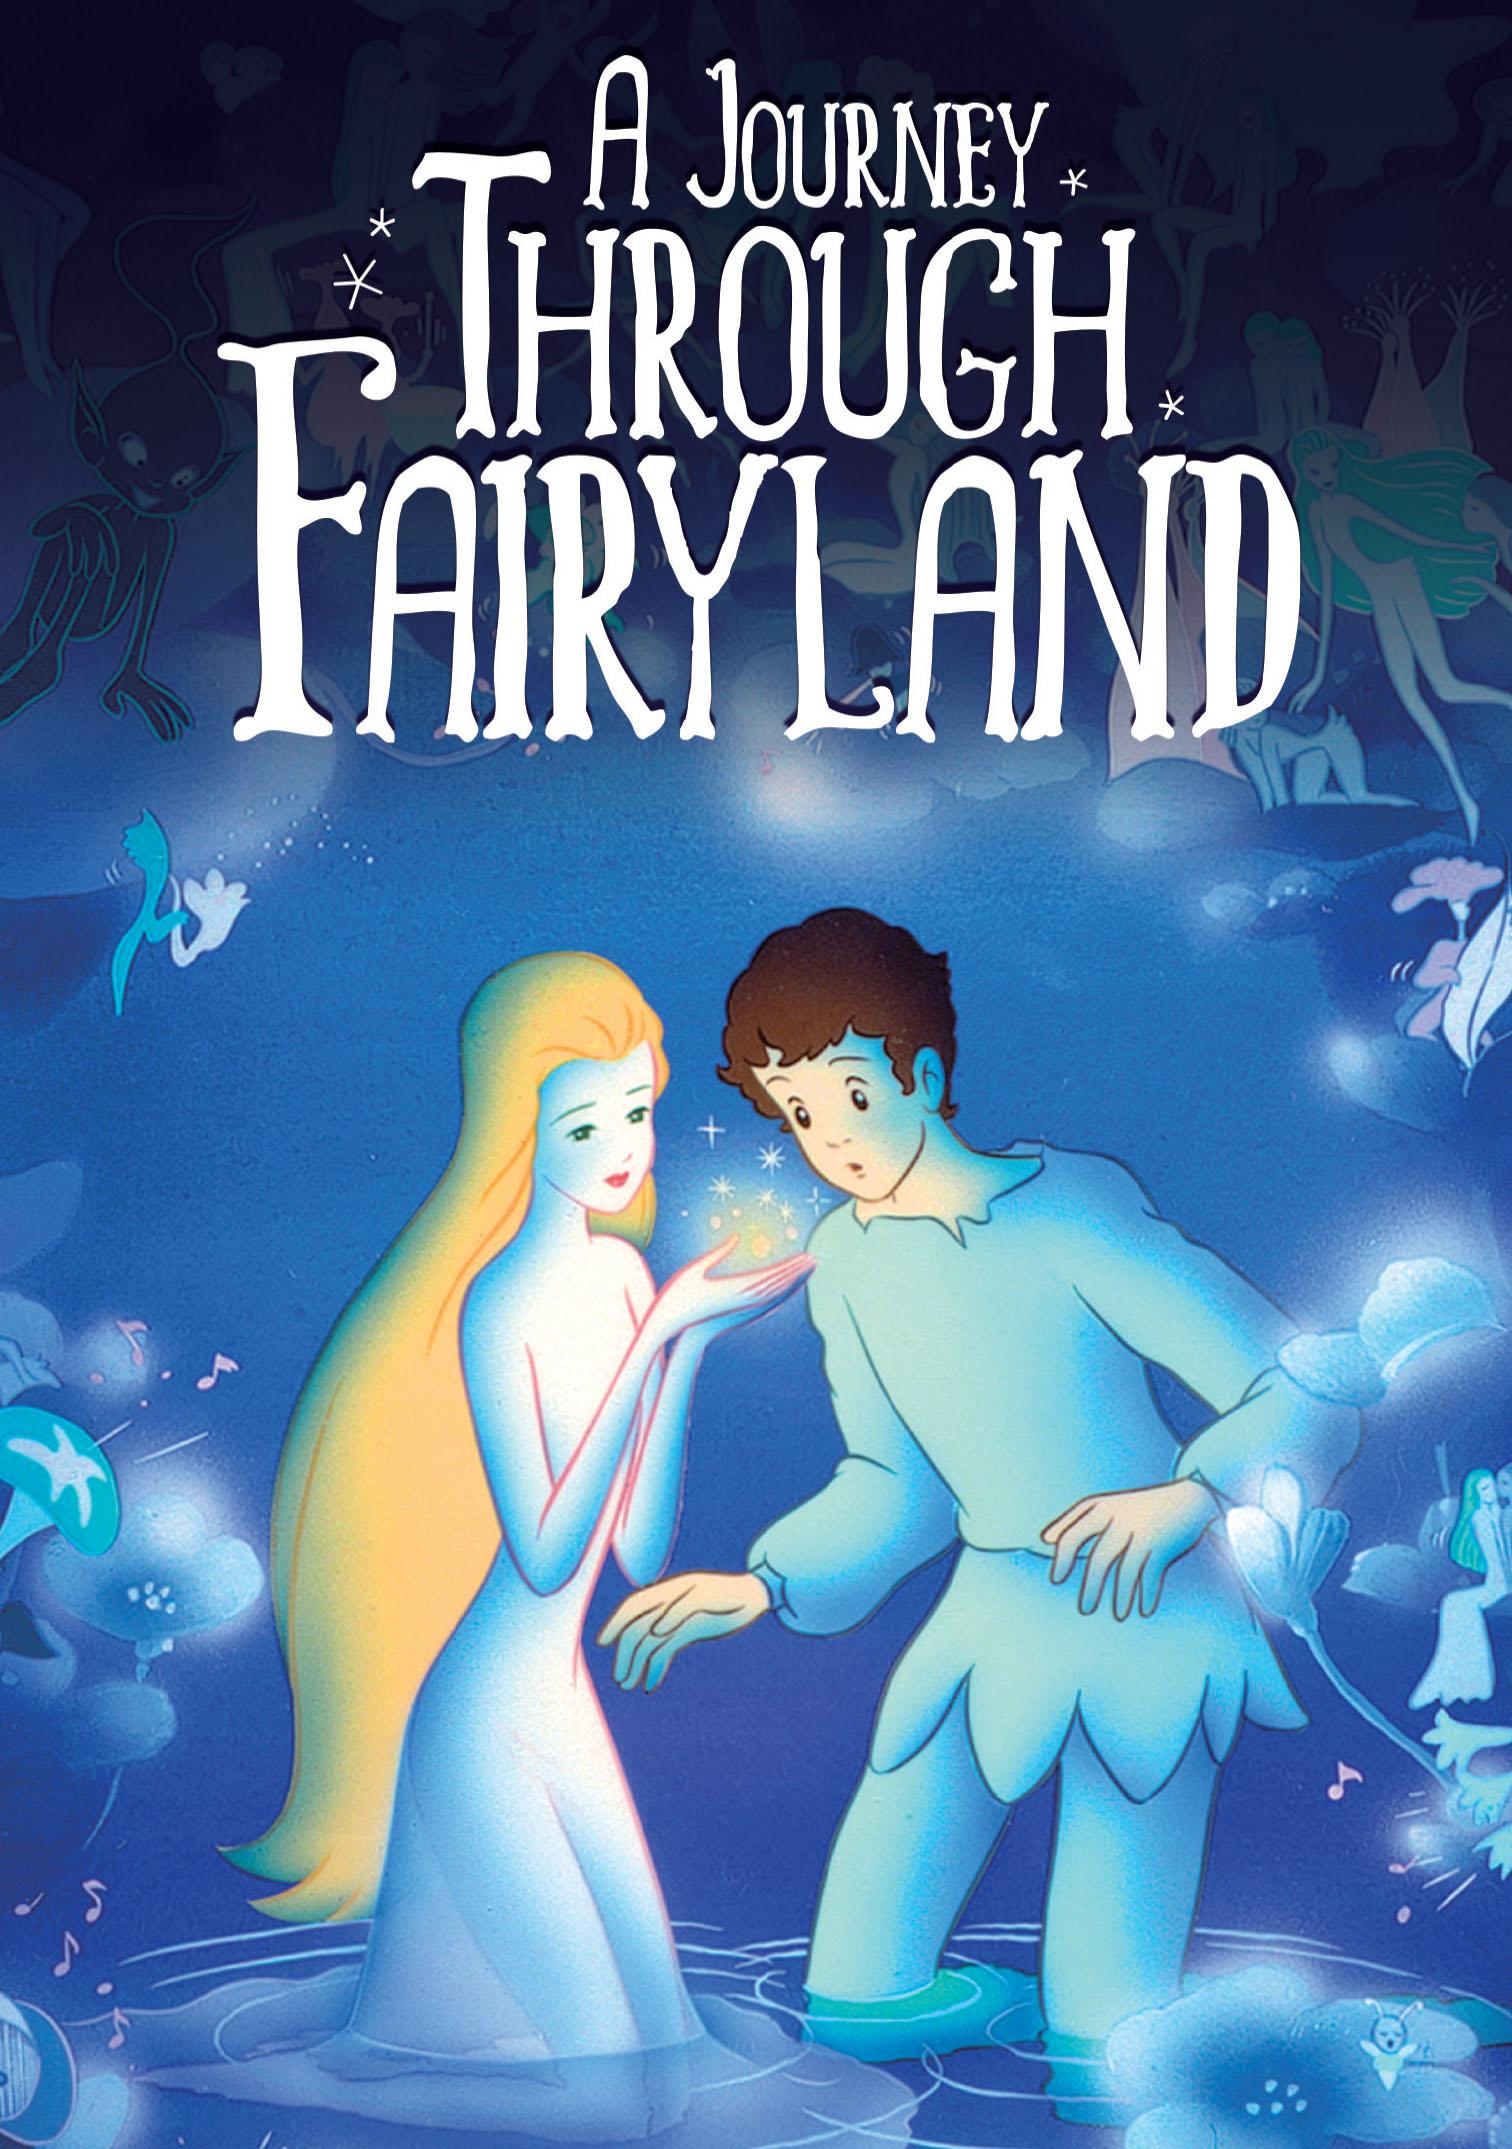 A Journey through Fairyland